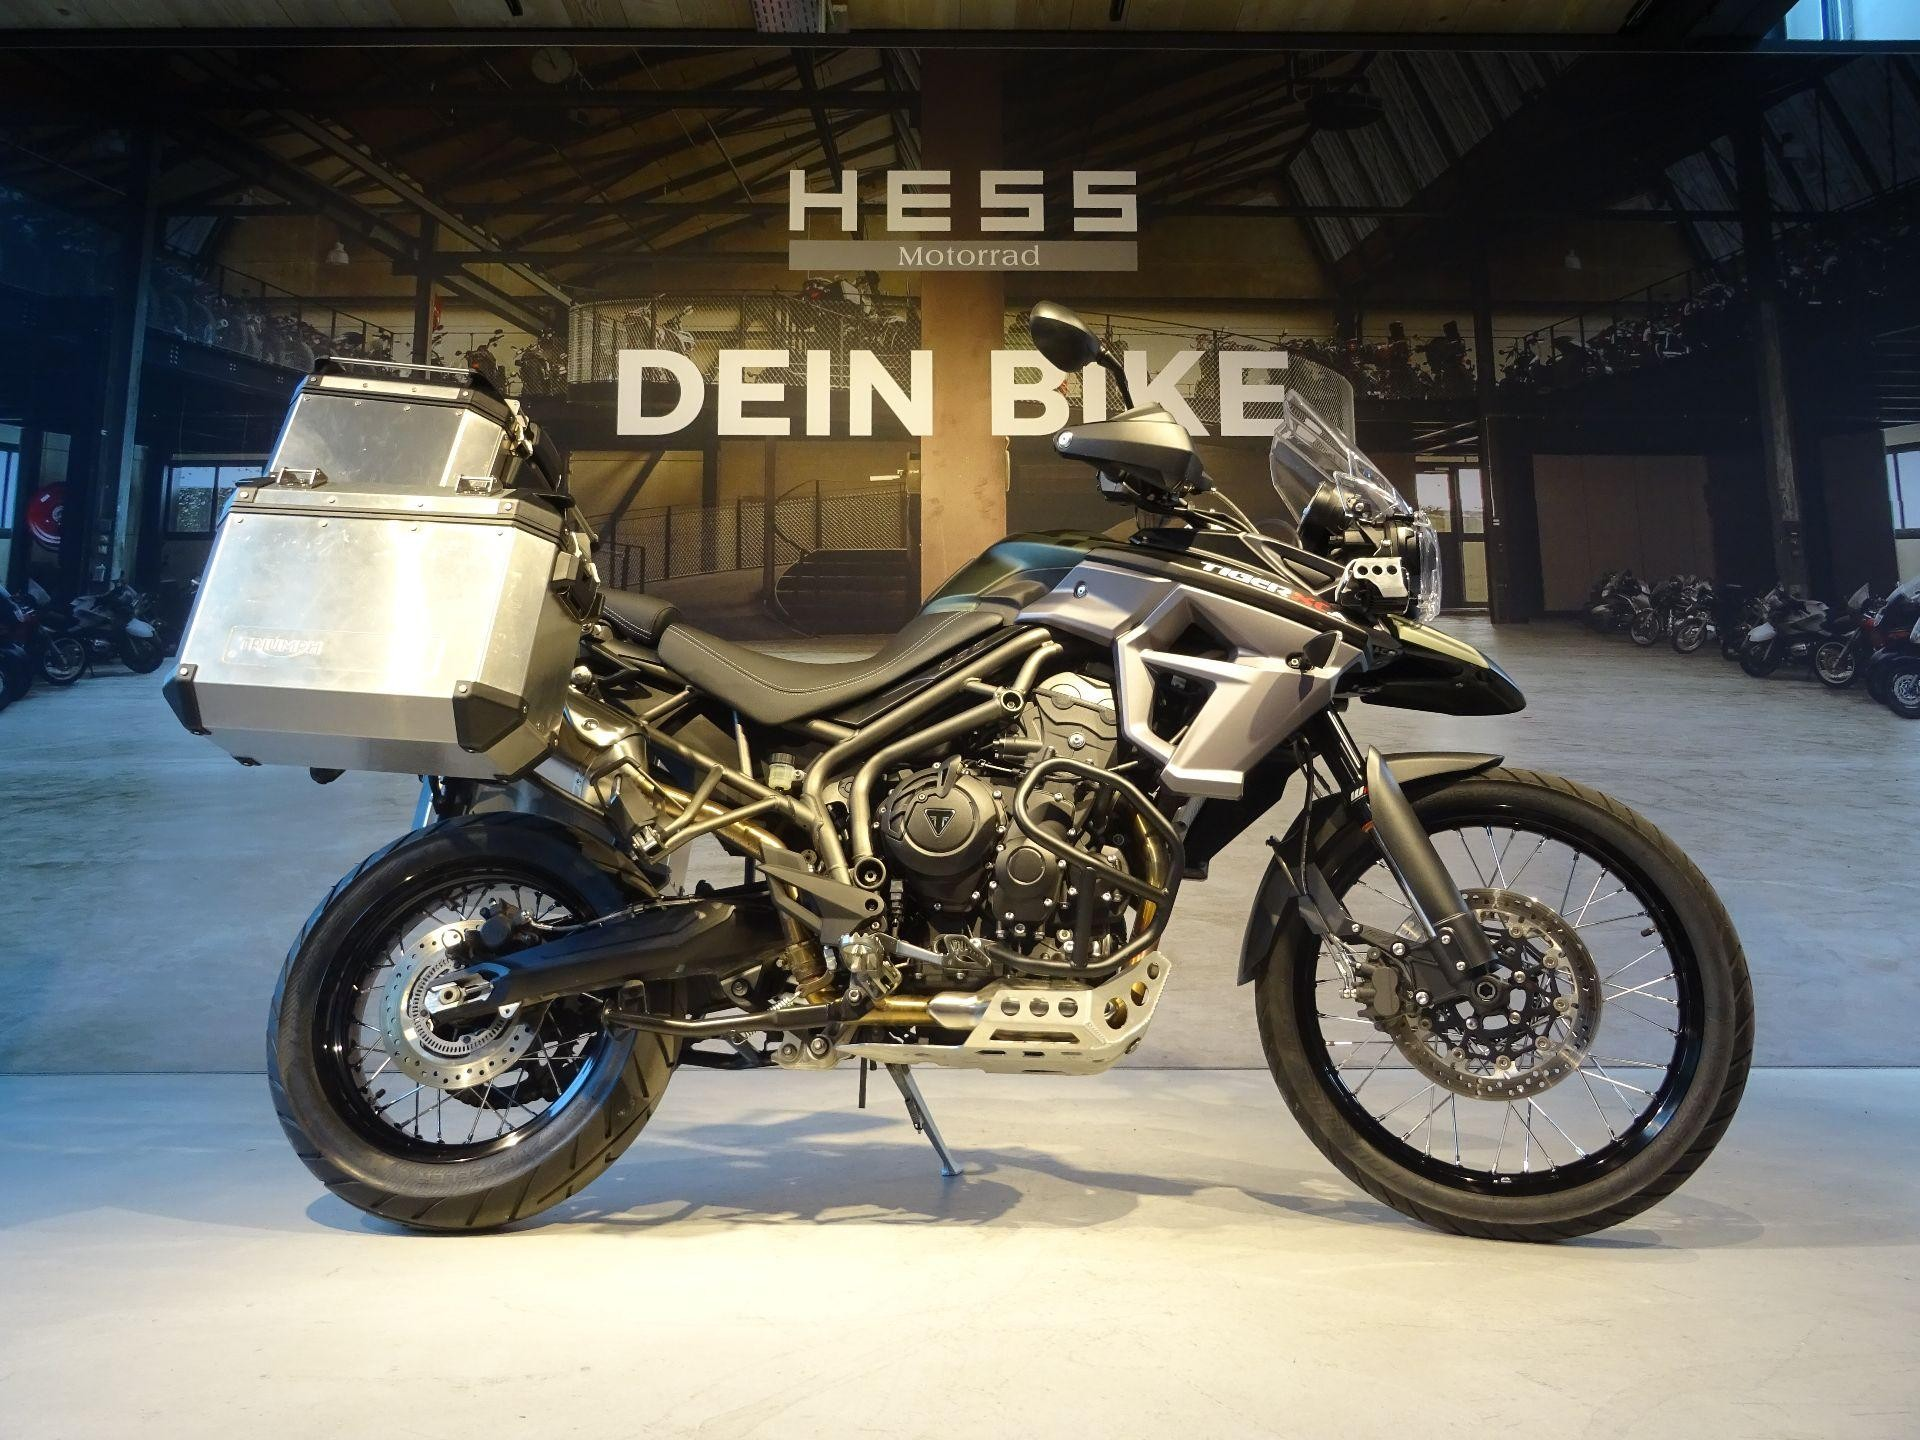 motorrad occasion kaufen triumph tiger 800 xcx abs hess. Black Bedroom Furniture Sets. Home Design Ideas